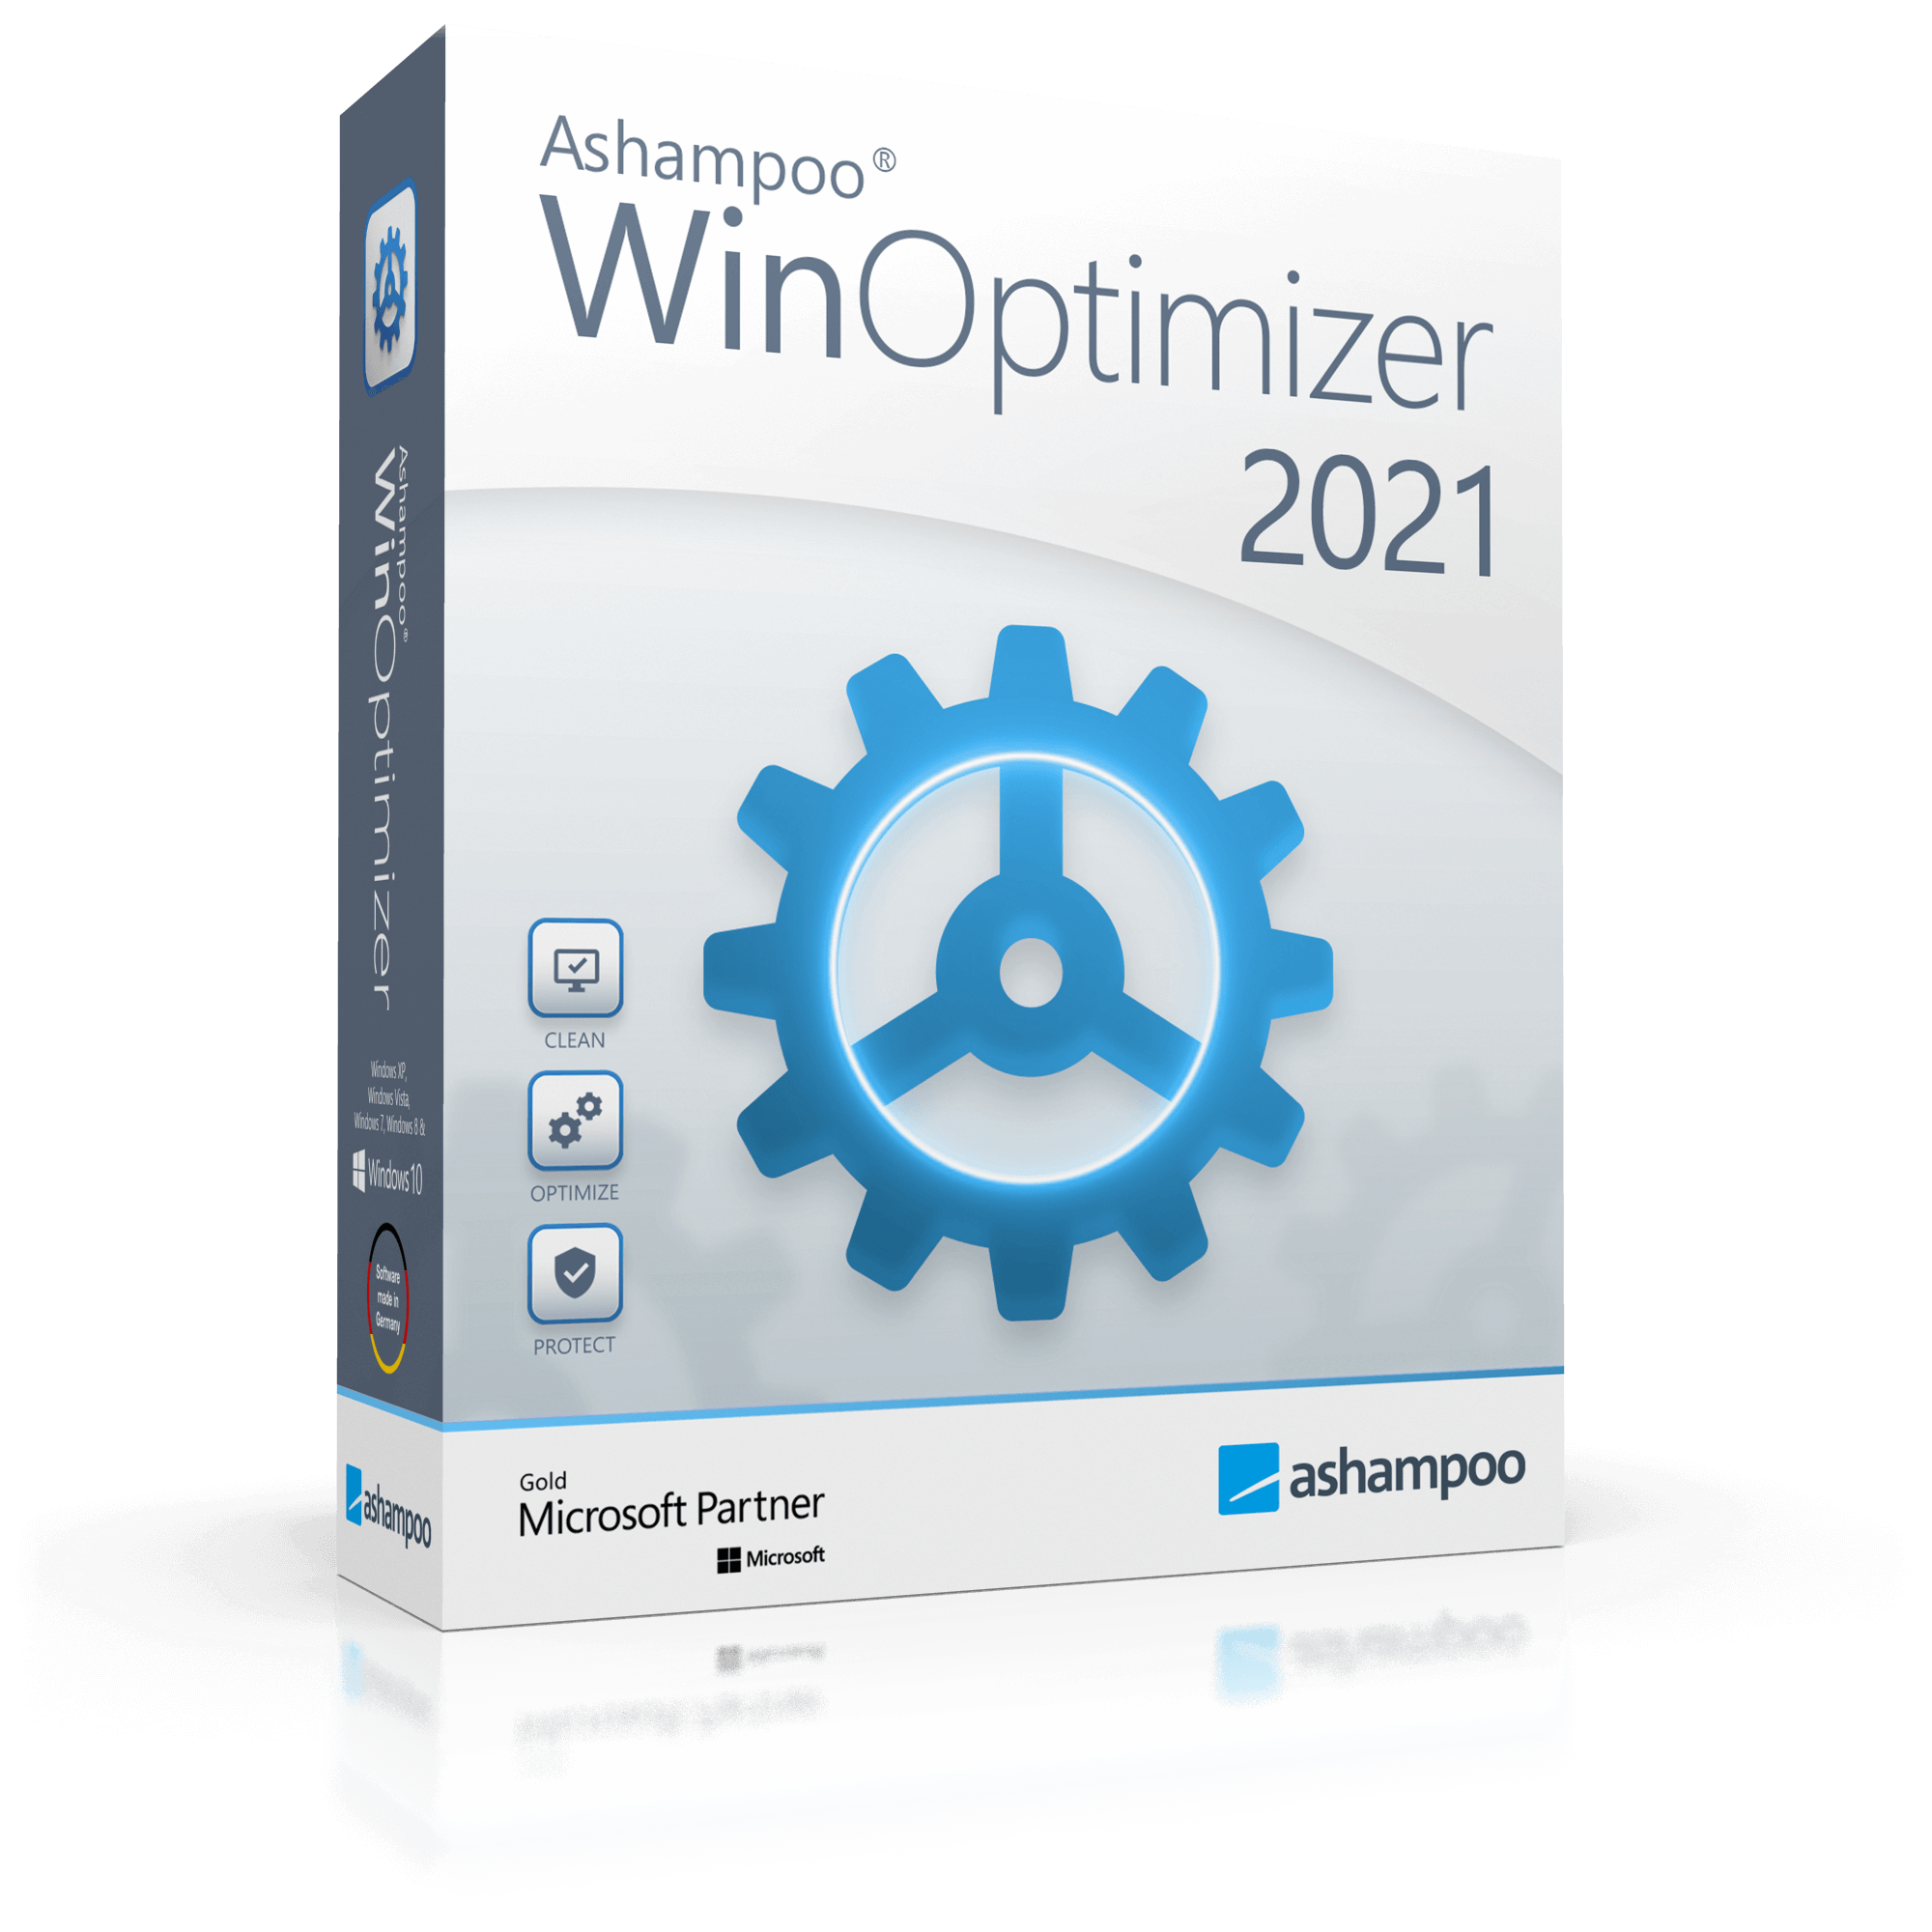 Ashampoo®  WinOptimizer 2021